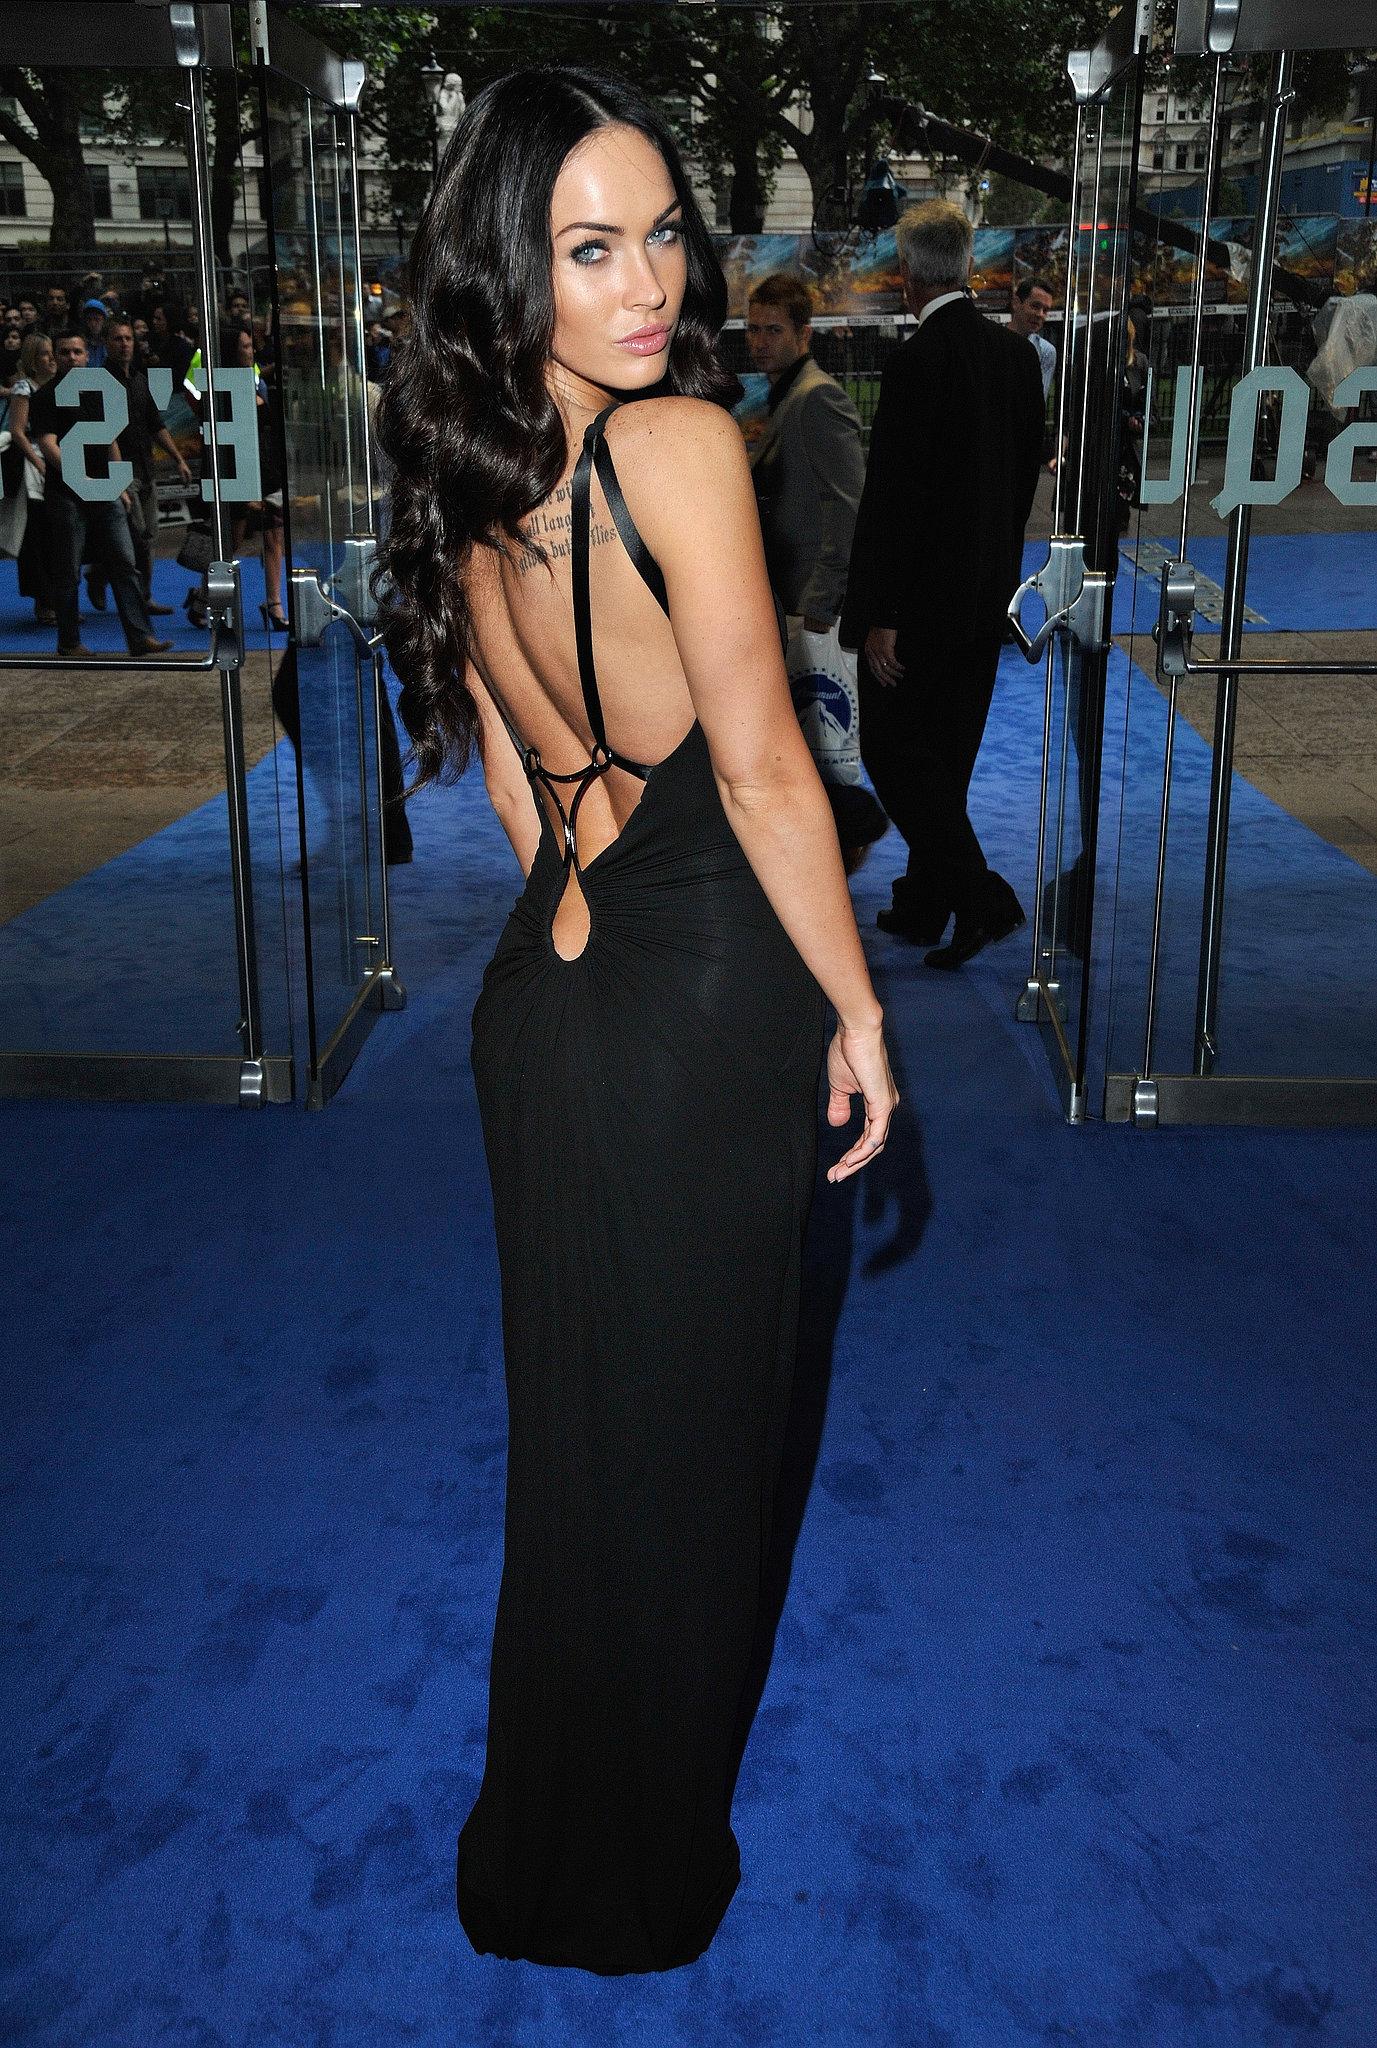 Megan Fox in Black KaufmanFranco at the 2009 Transformers: Revenge of the Fallen UK Premiere